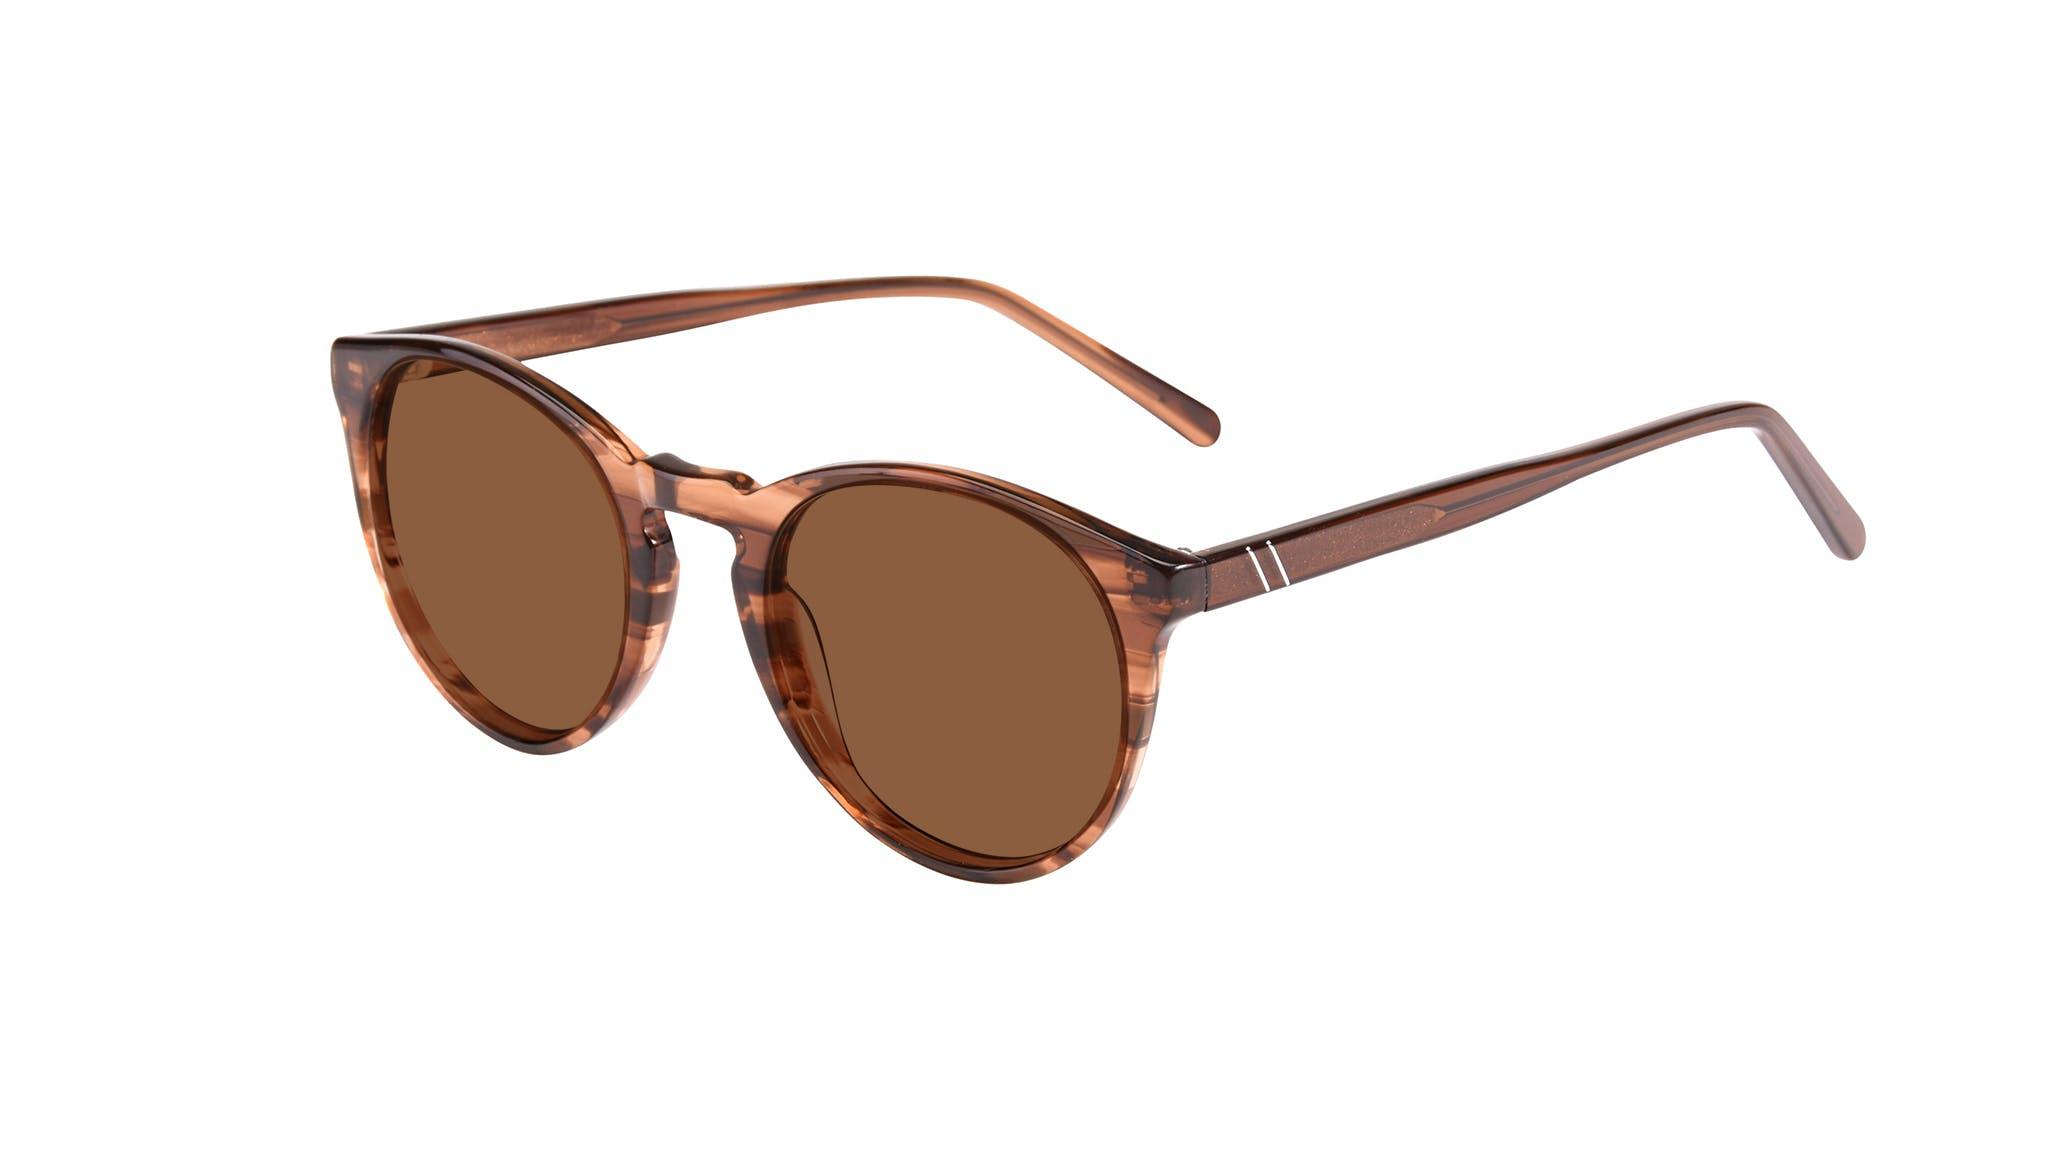 Affordable Fashion Glasses Round Sunglasses Men Arch Wood Tilt